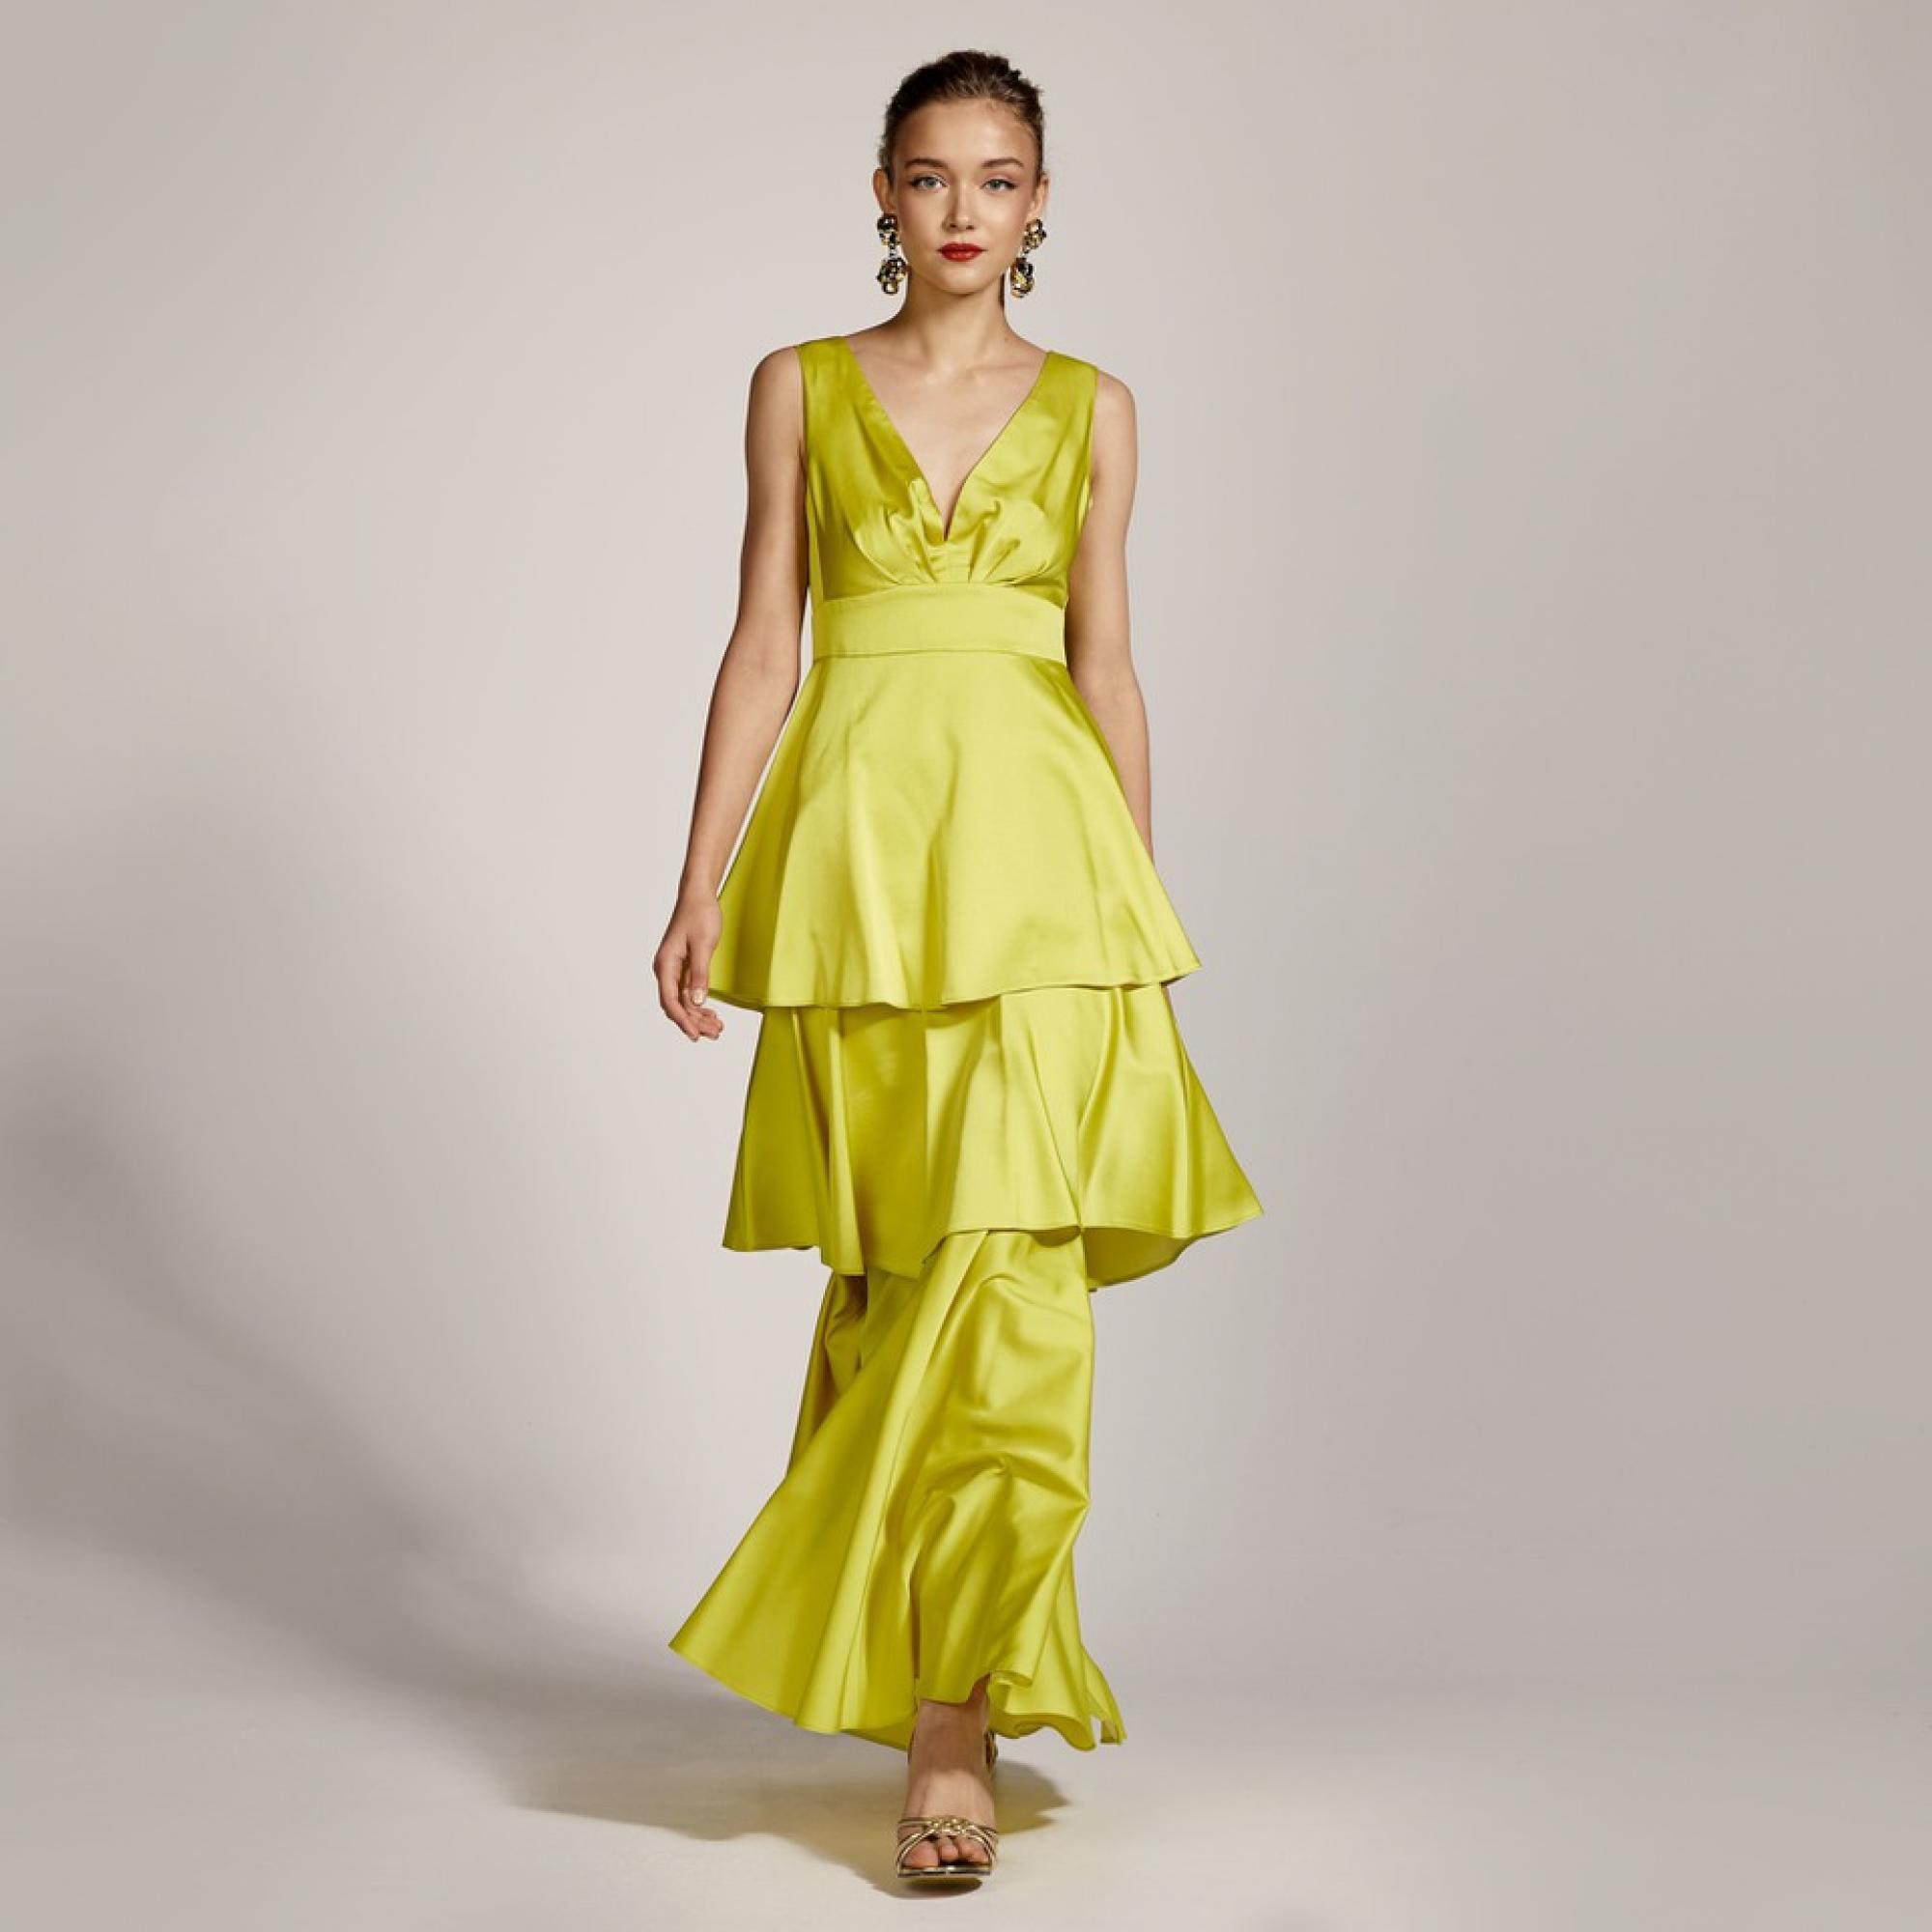 Abito con maxi balze ACCESS fashion | S1-3005LIME YELLOW